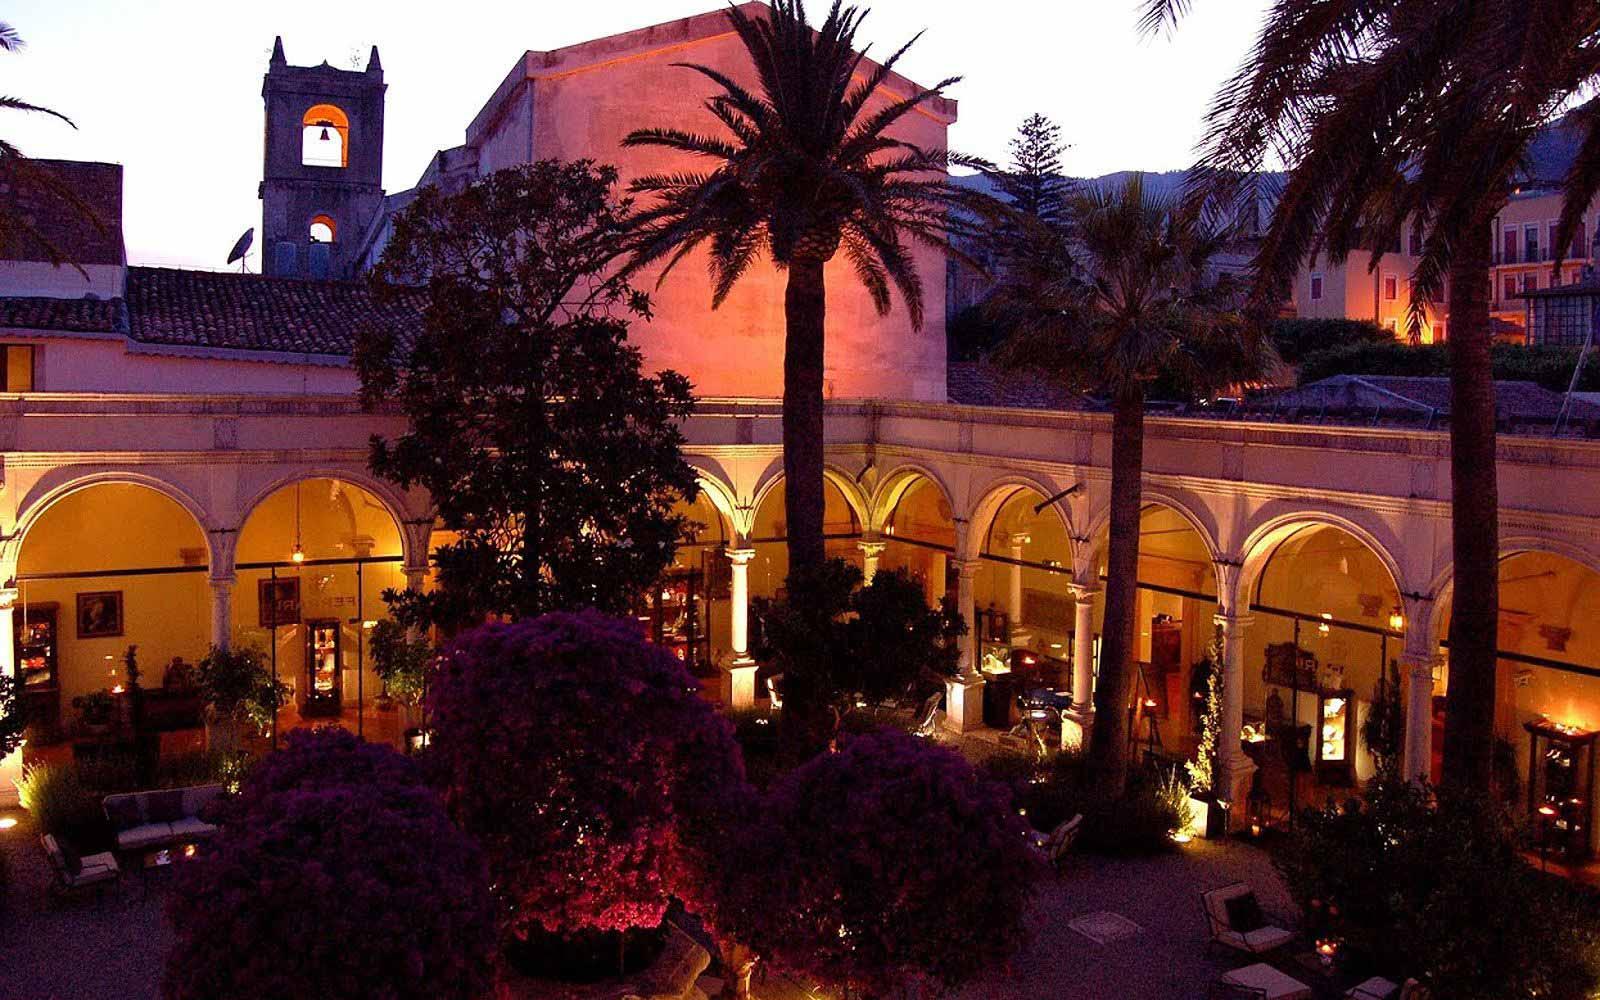 San Domenico Palace Hotel at night